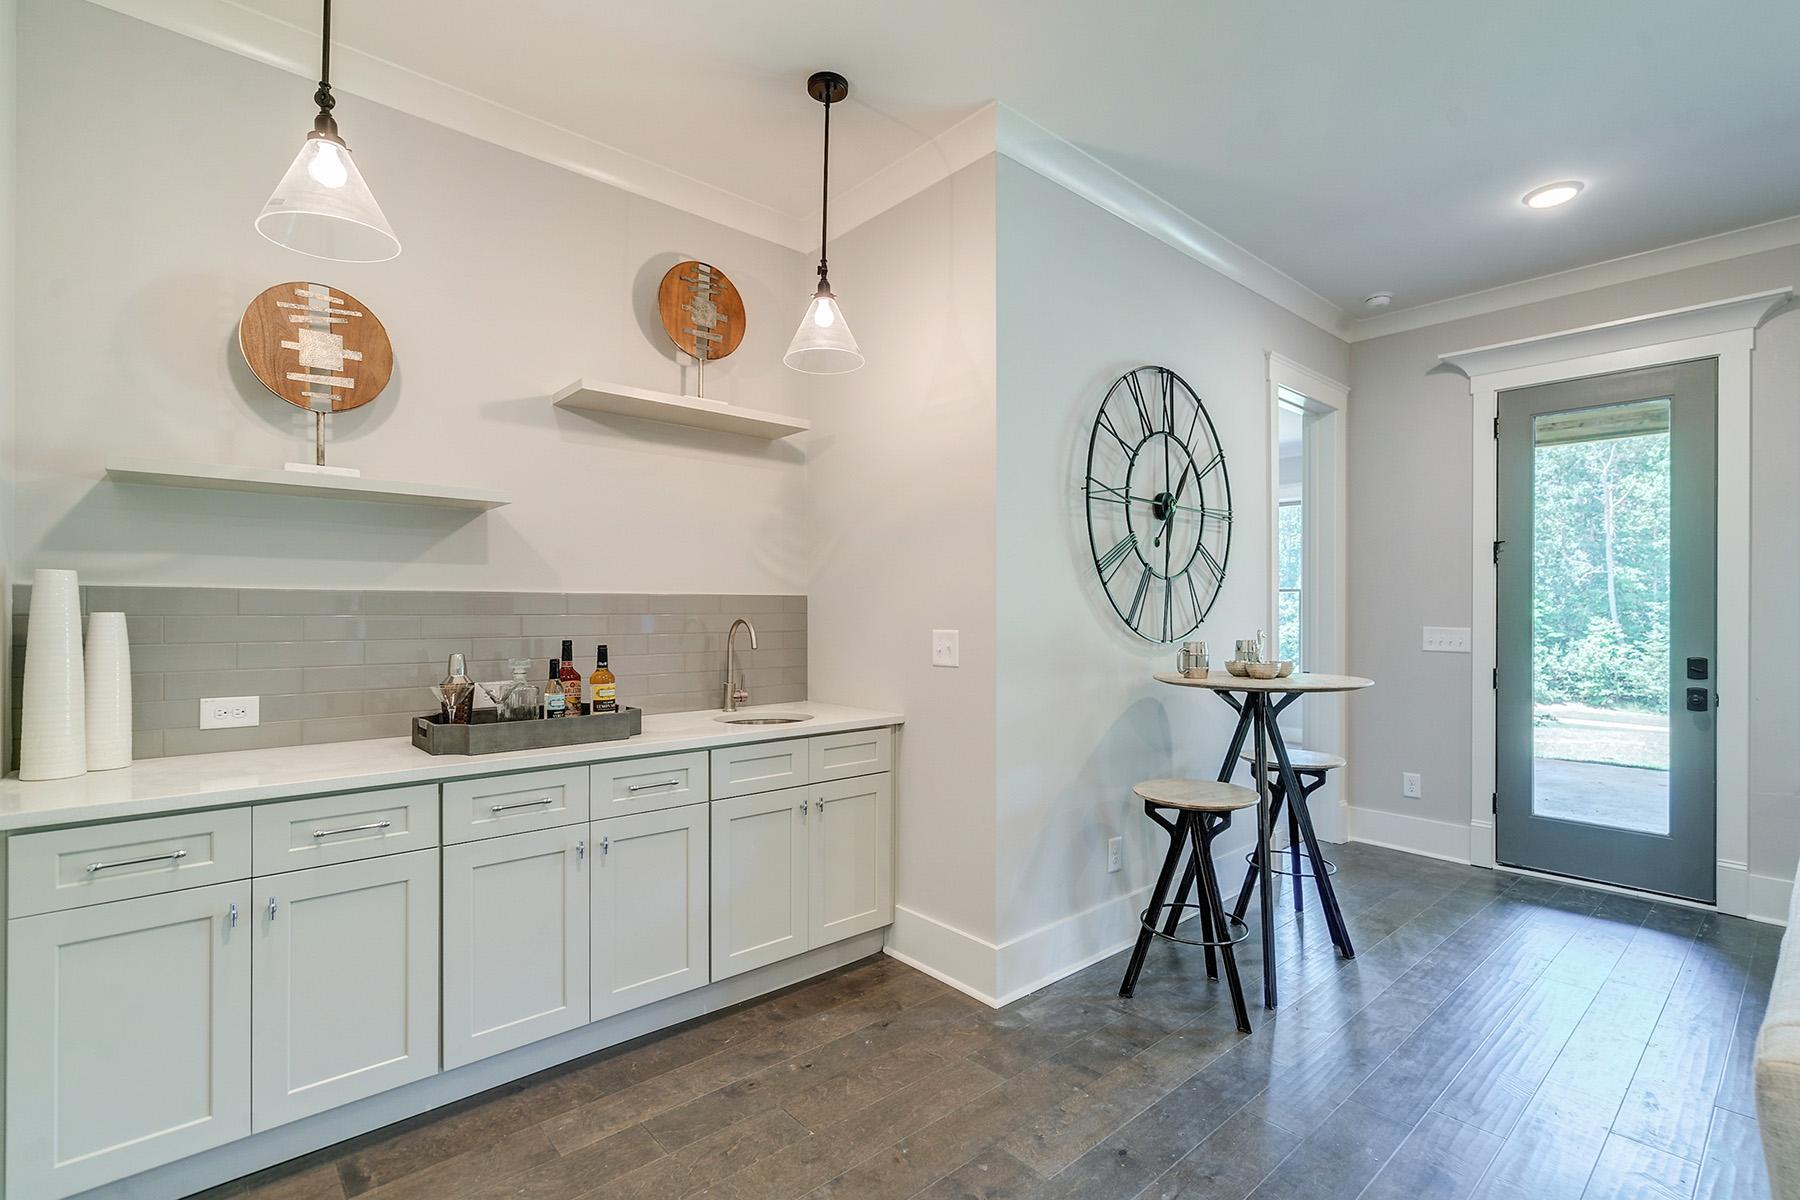 Additional photo for property listing at A Stunning Modern Farmhouse in Chestatee 115 Stoneridge Court, Dawsonville, Georgia 30534 Amerika Birleşik Devletleri